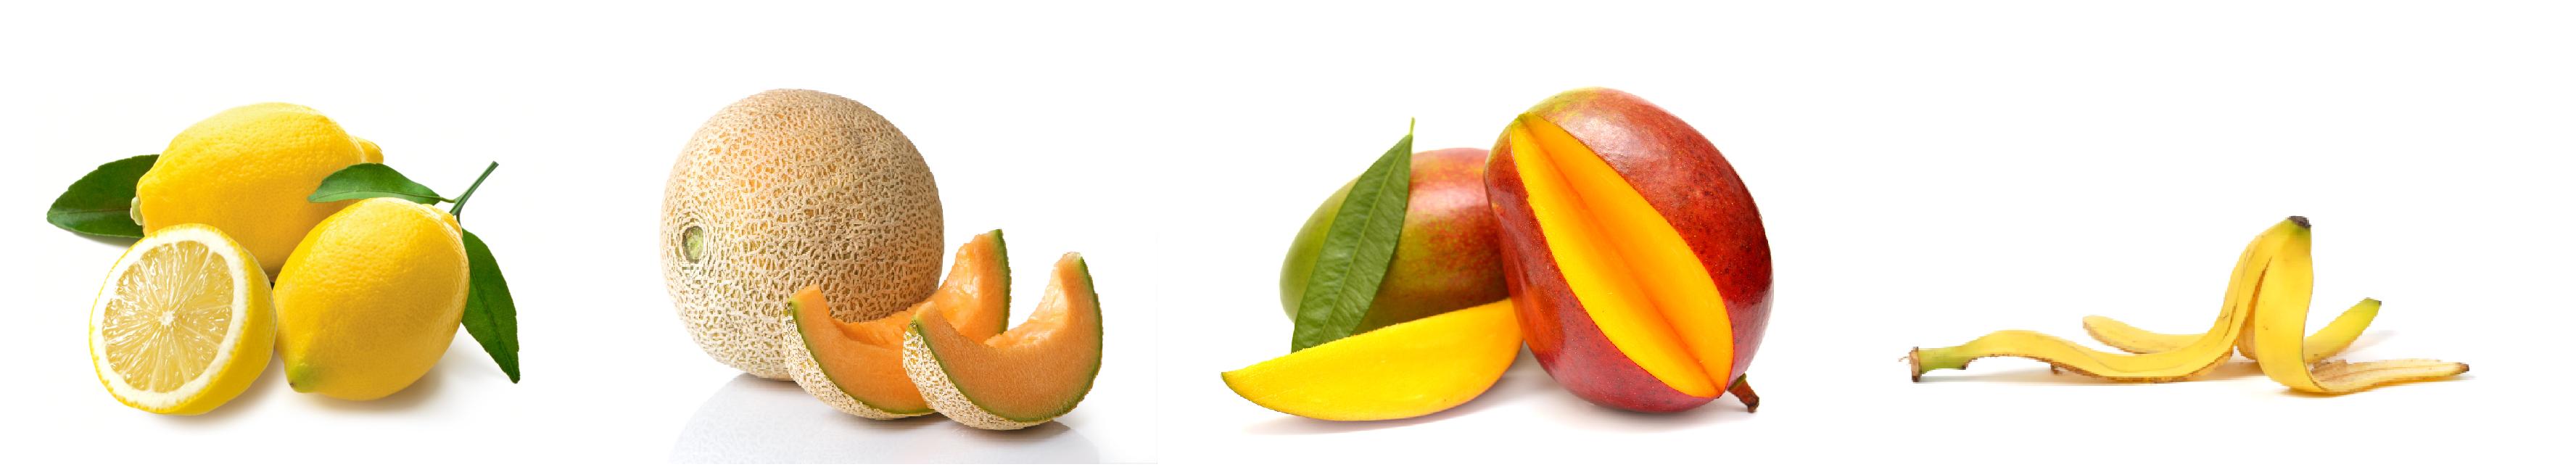 owoce_piersi